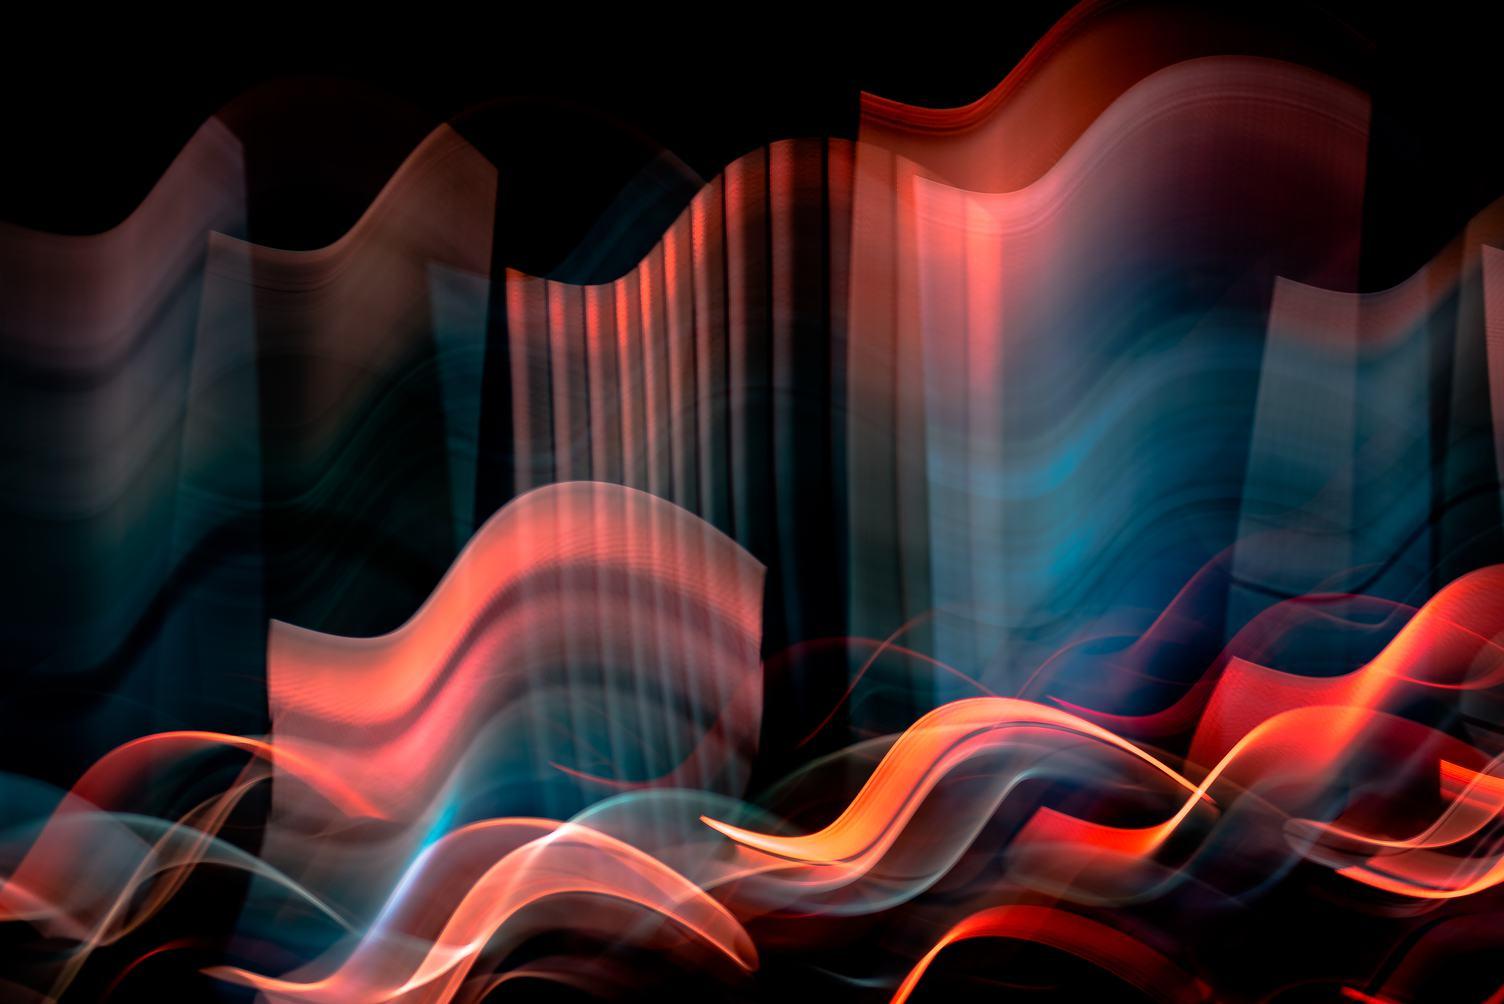 Amazing Abstract Light Streaks